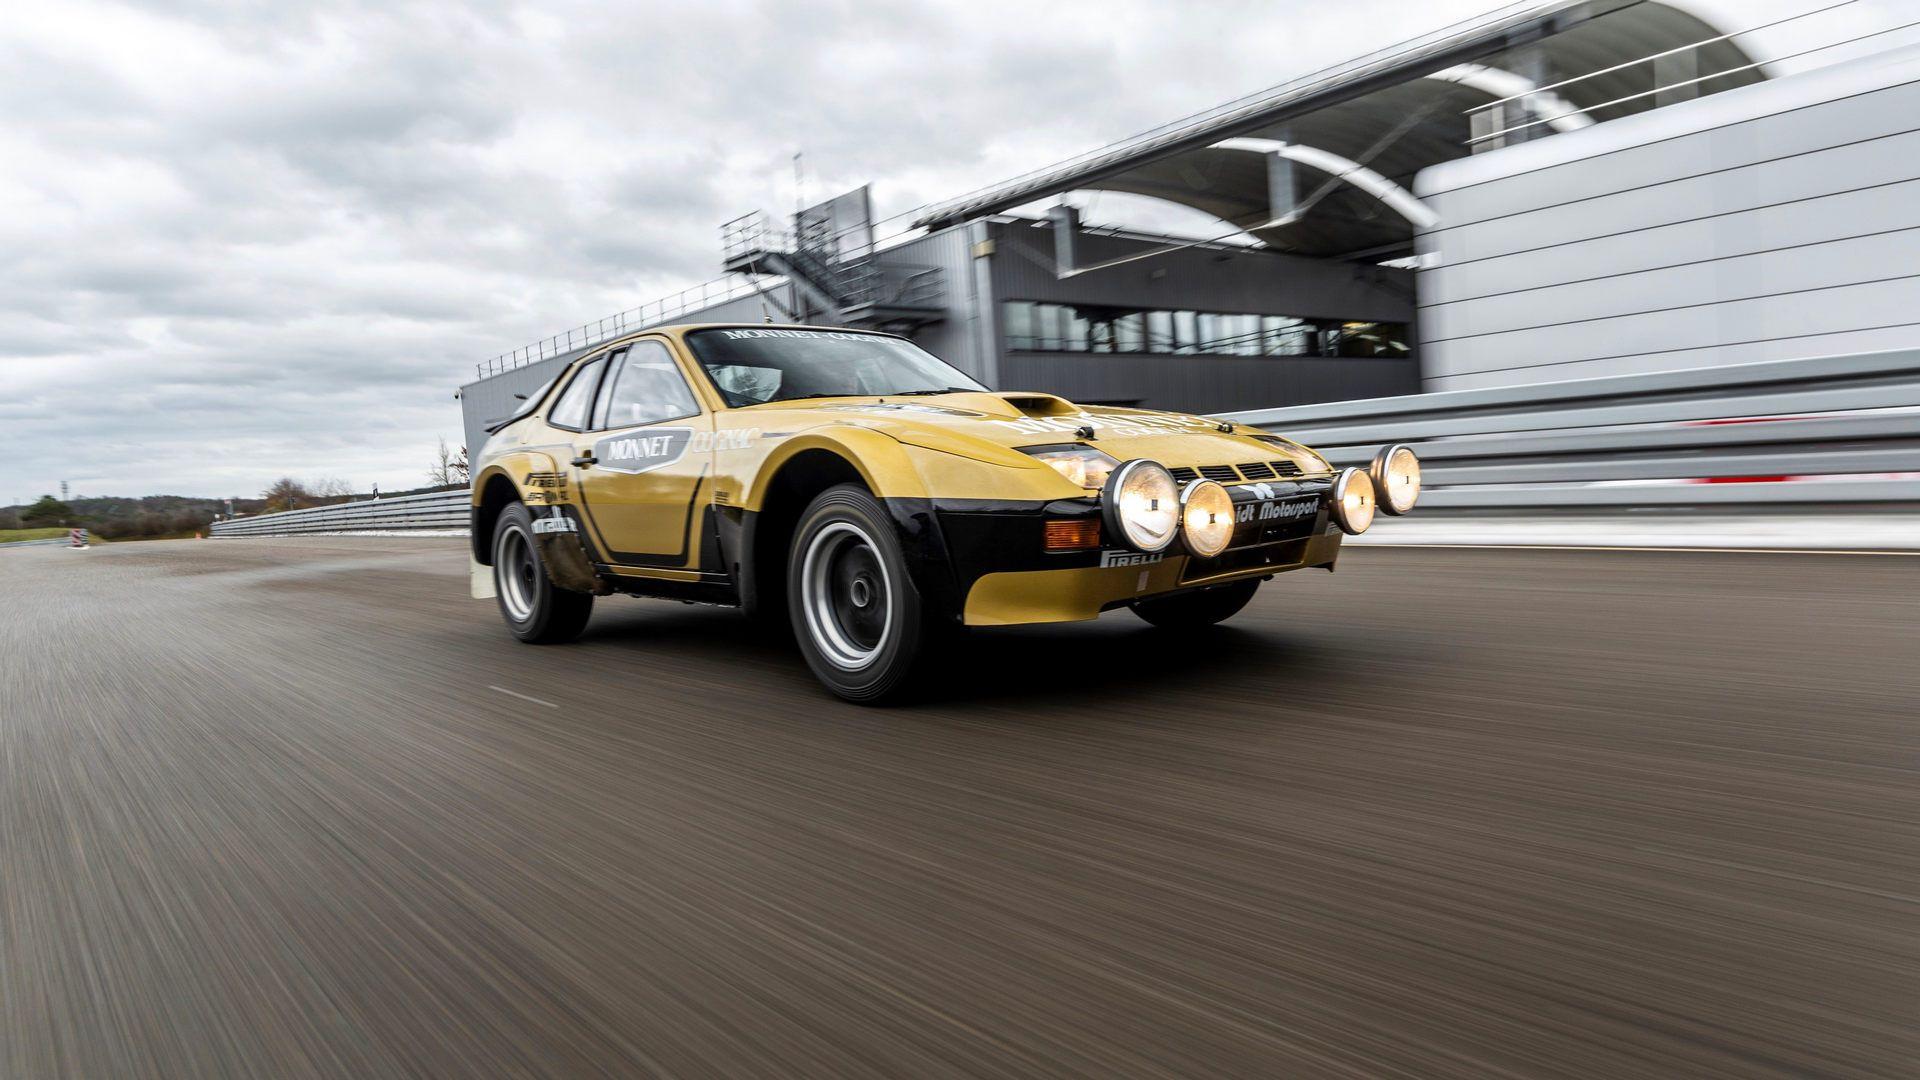 Porsche-924-Carrera-GTS-rally-car-Walter-Rohrl-7